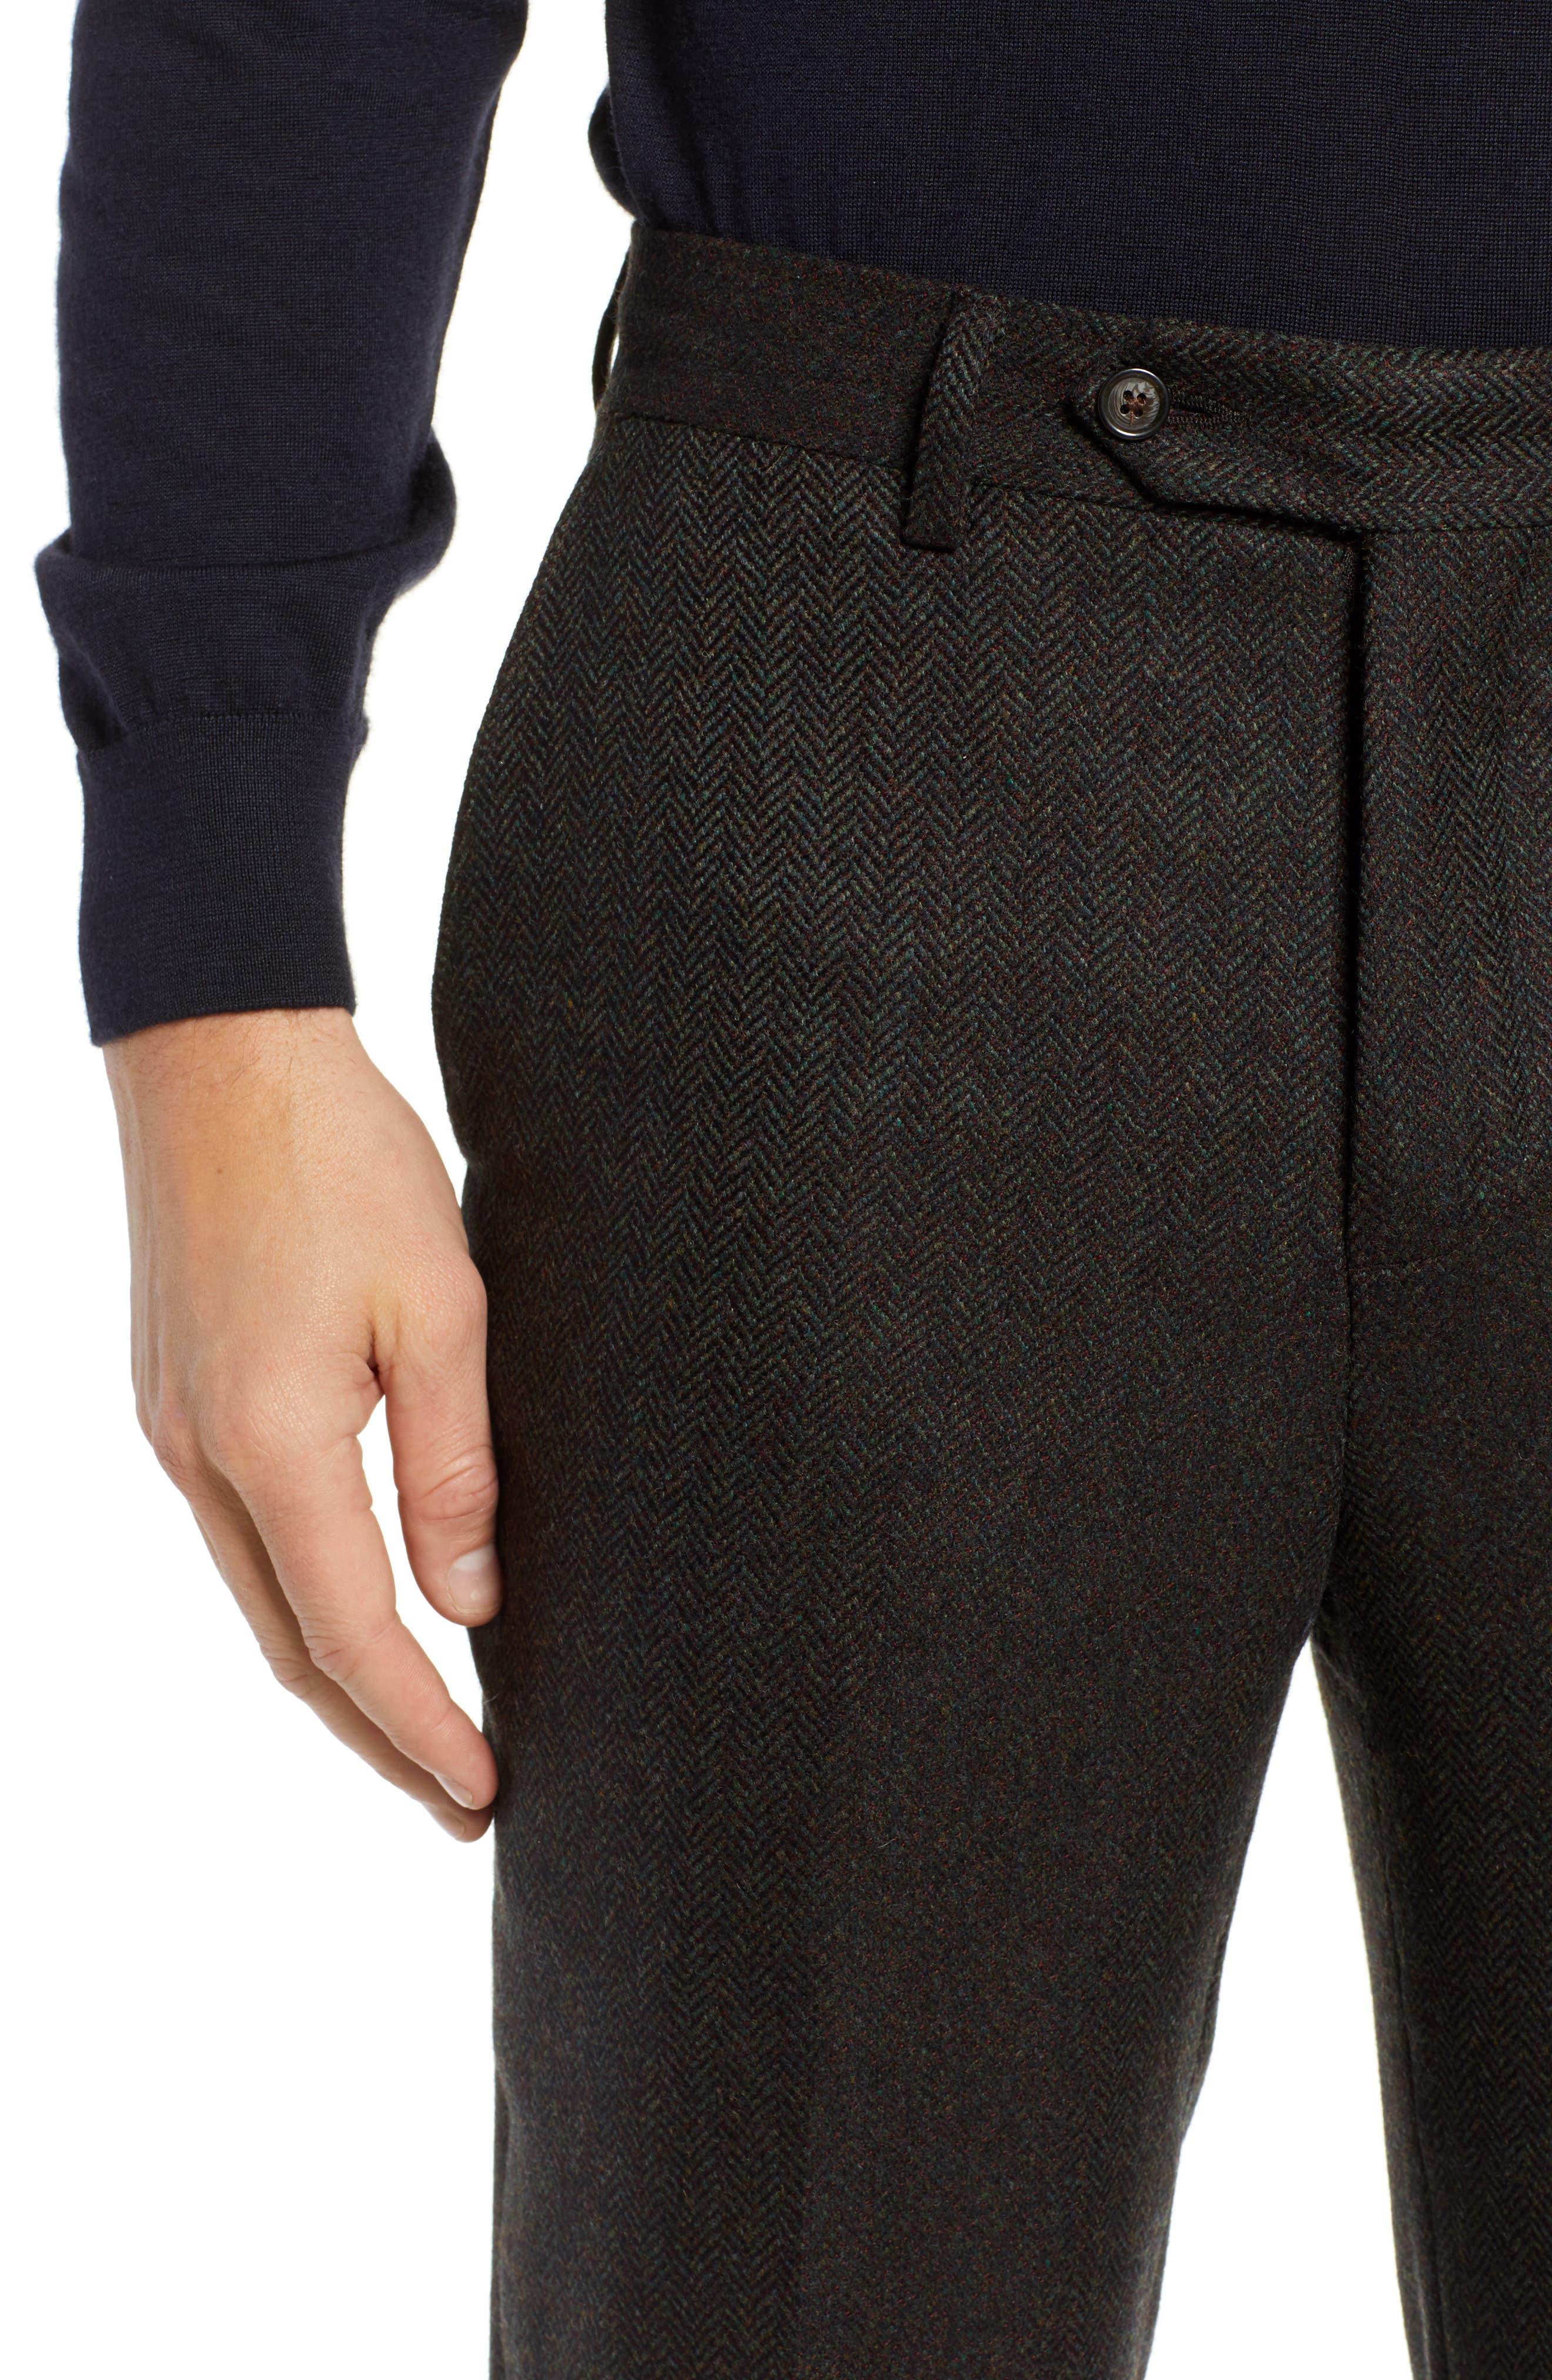 Flat Front Herringbone Wool & Cashmere Trousers,                             Alternate thumbnail 4, color,                             DARK OLIVE